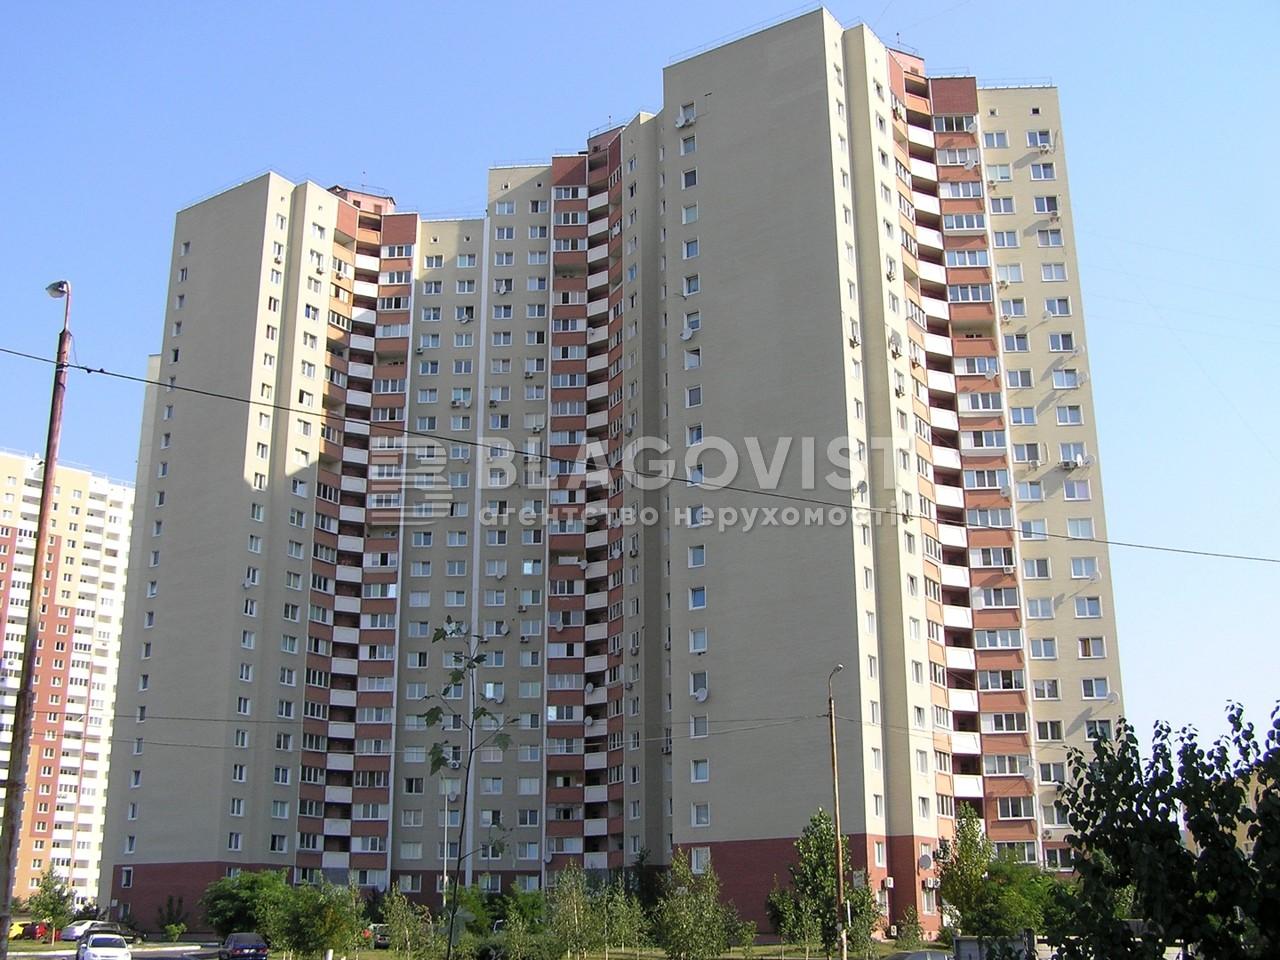 Квартира C-107577, Милославская, 12, Киев - Фото 1